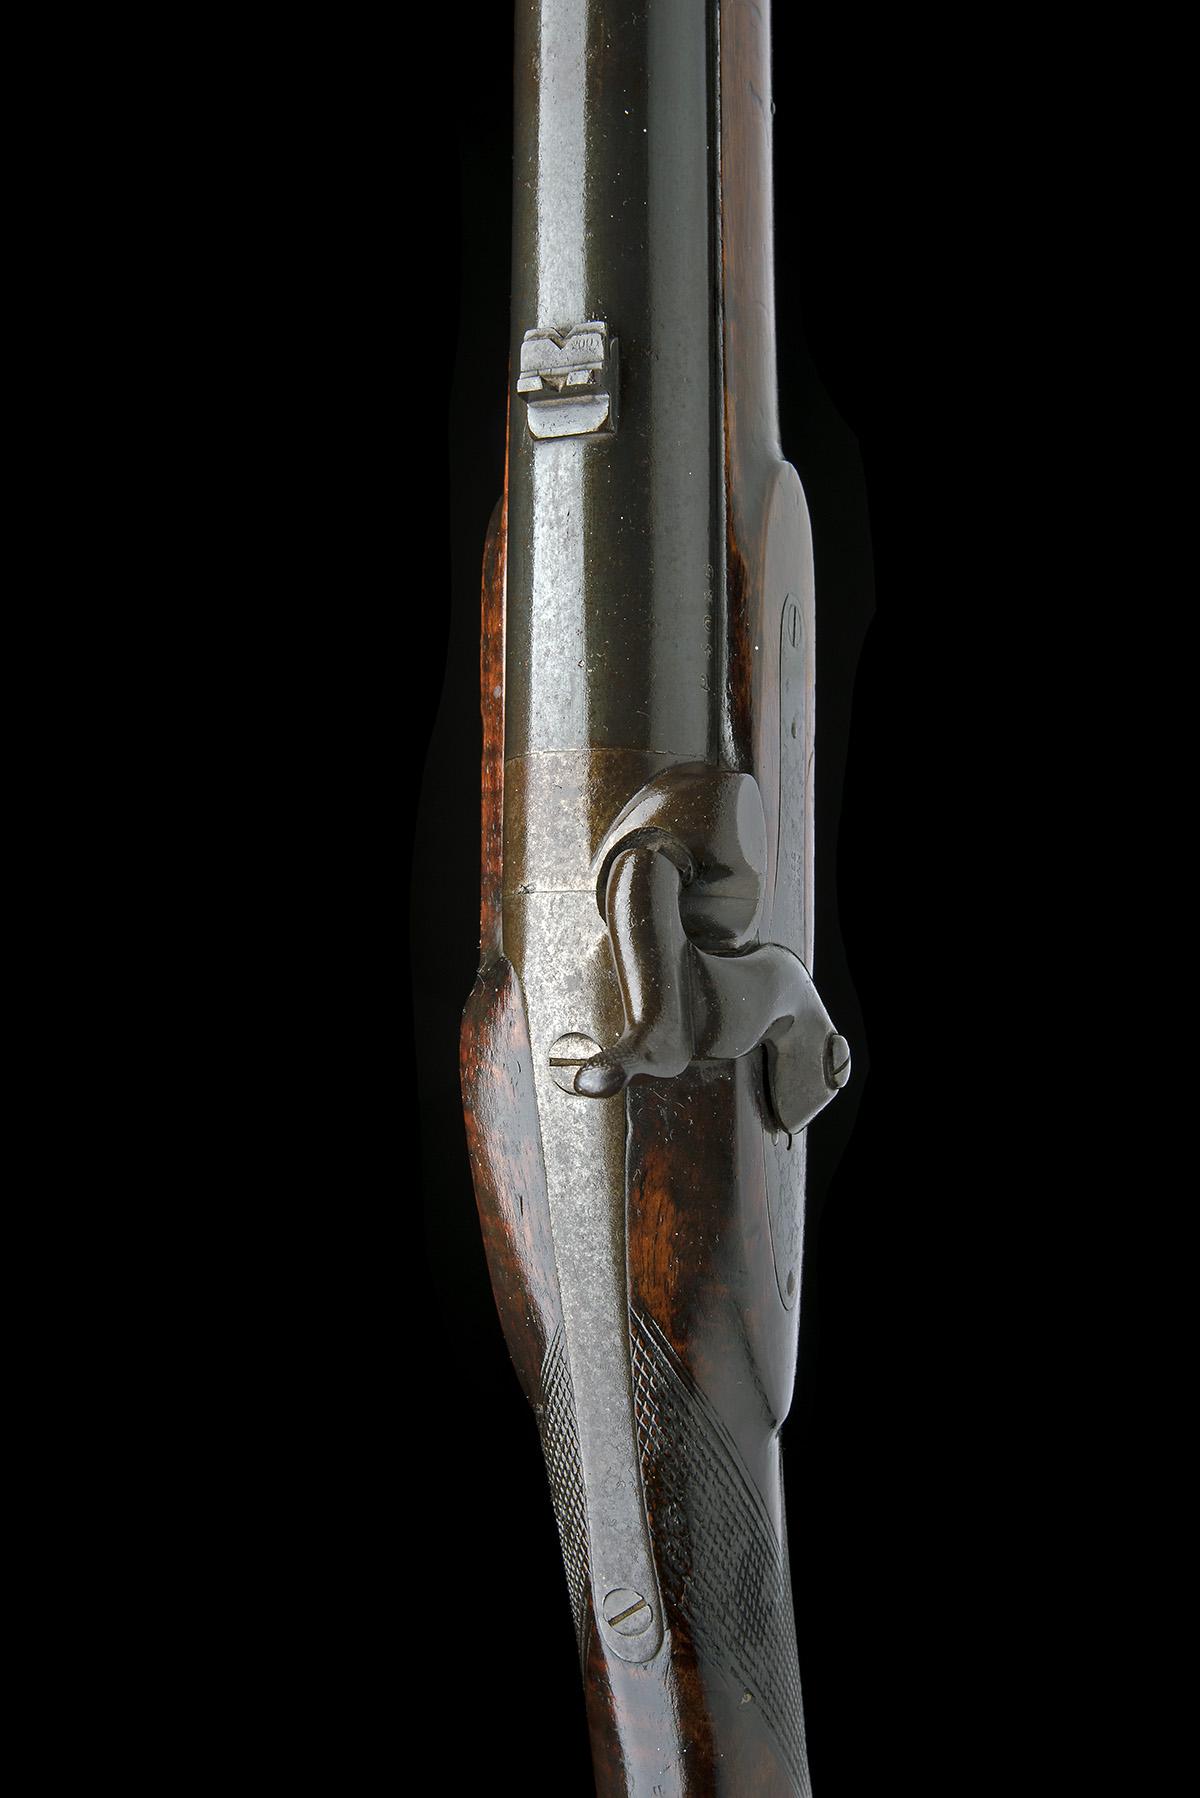 C.G. BALES, DURBAN, SOUTH AFRICA A RARE 4-BORE PERCUSSION RIFLED SHOT & BALL GUN FOR DANGEROUS GAME, - Image 6 of 10